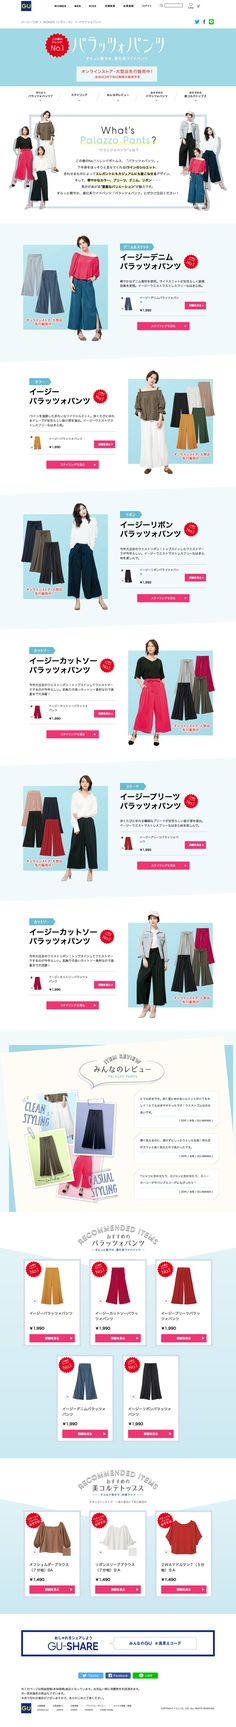 GU(ジーユー)進化系ワイドパンツ|パラッツォパンツ http://www.gu-japan.com/feature/palazzopants/